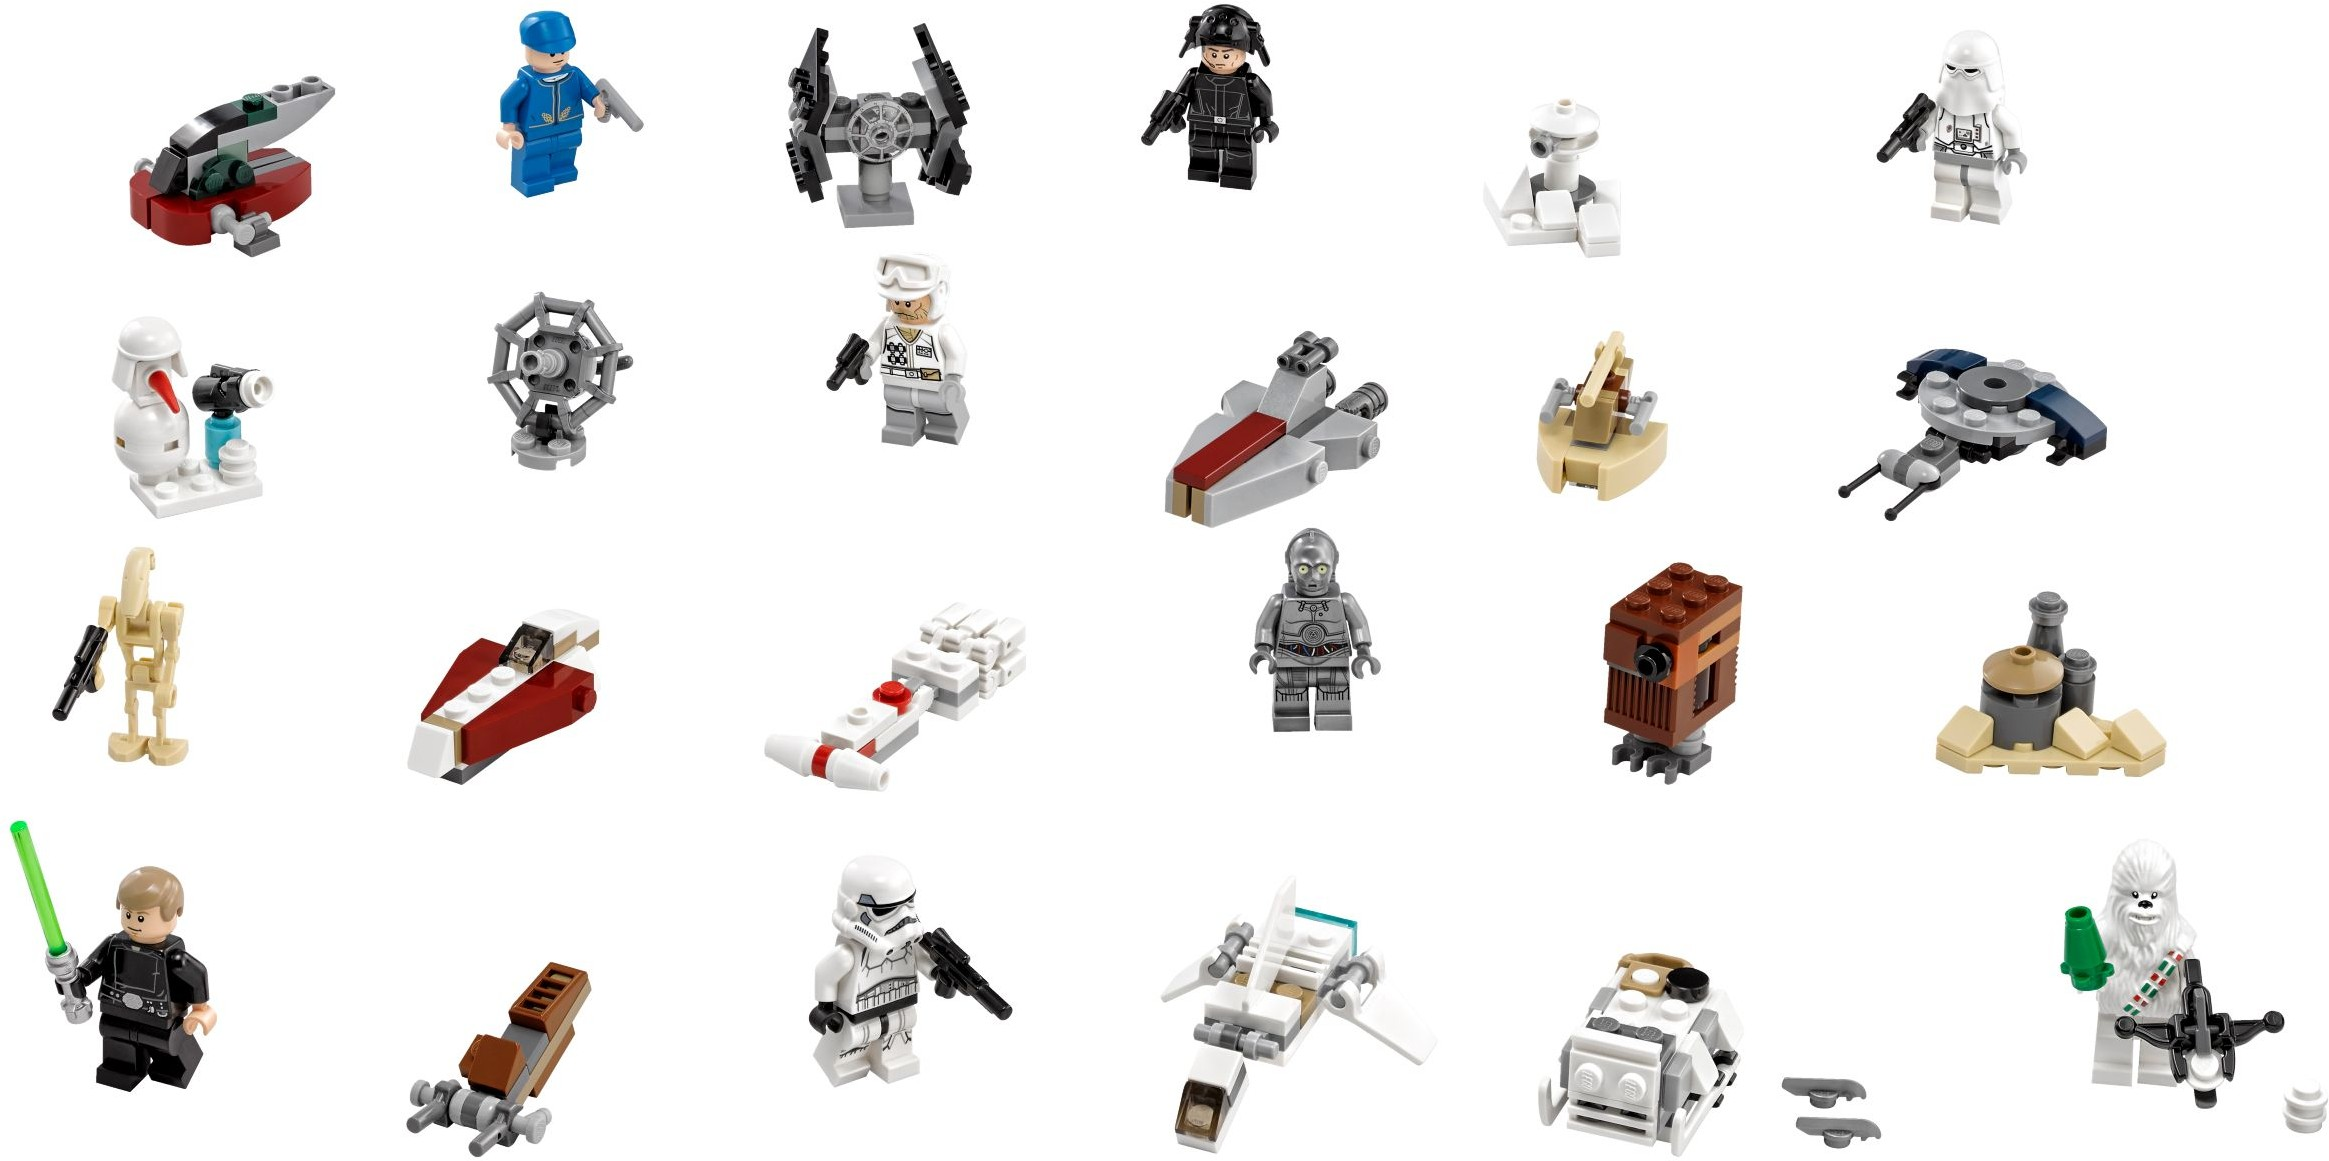 New Star Wars Lego Minifig - set 75097 LIN Demolitionmech Droid sw0681